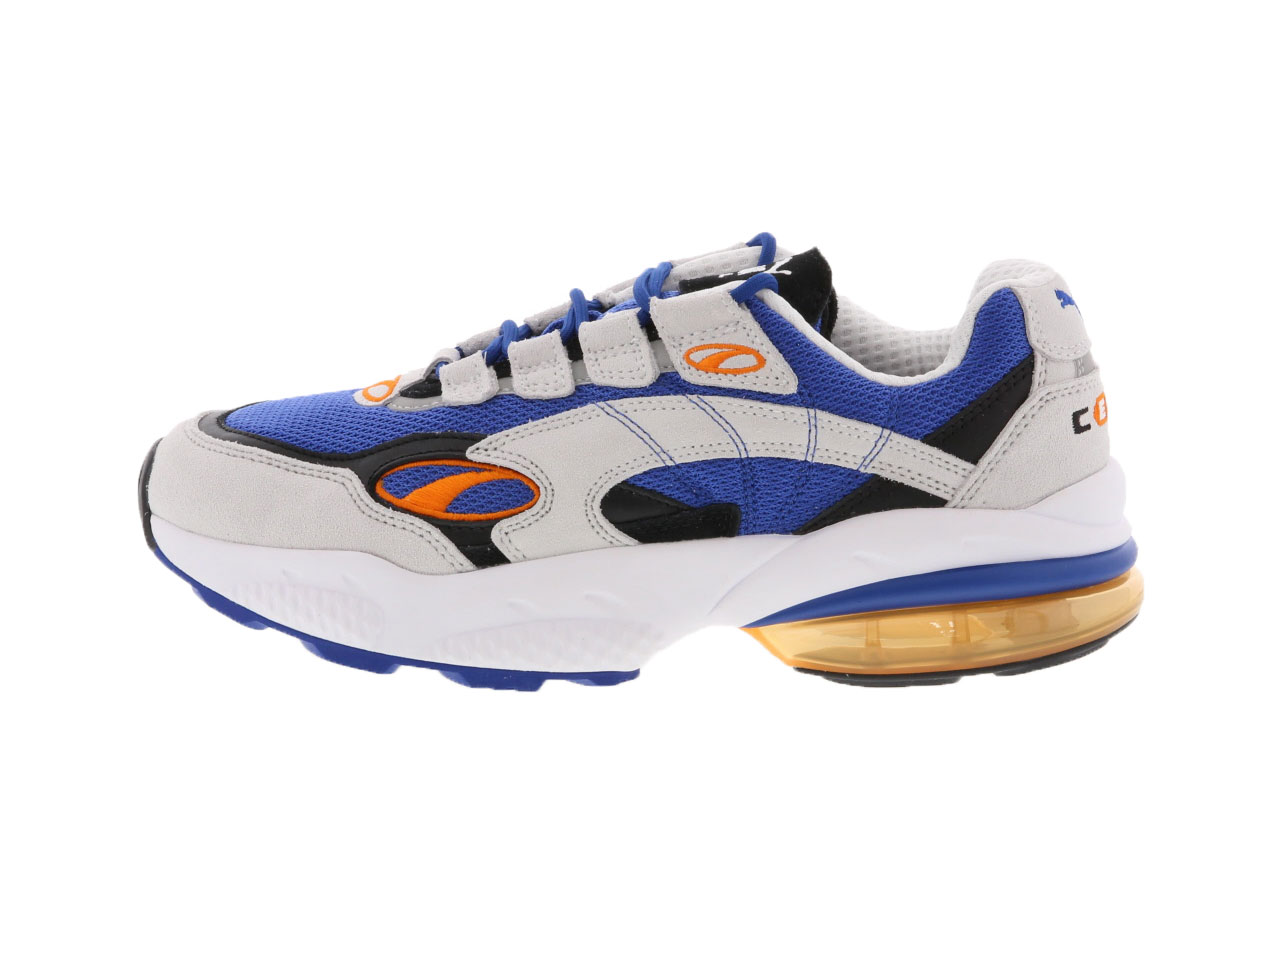 PUMA CELL VENOM(369354-02)【プーマ】【メンズファッション】【シューズ】【スニーカー】【靴】【フットウェア】【ストアレビュー記載でソックスプレゼント対象品】